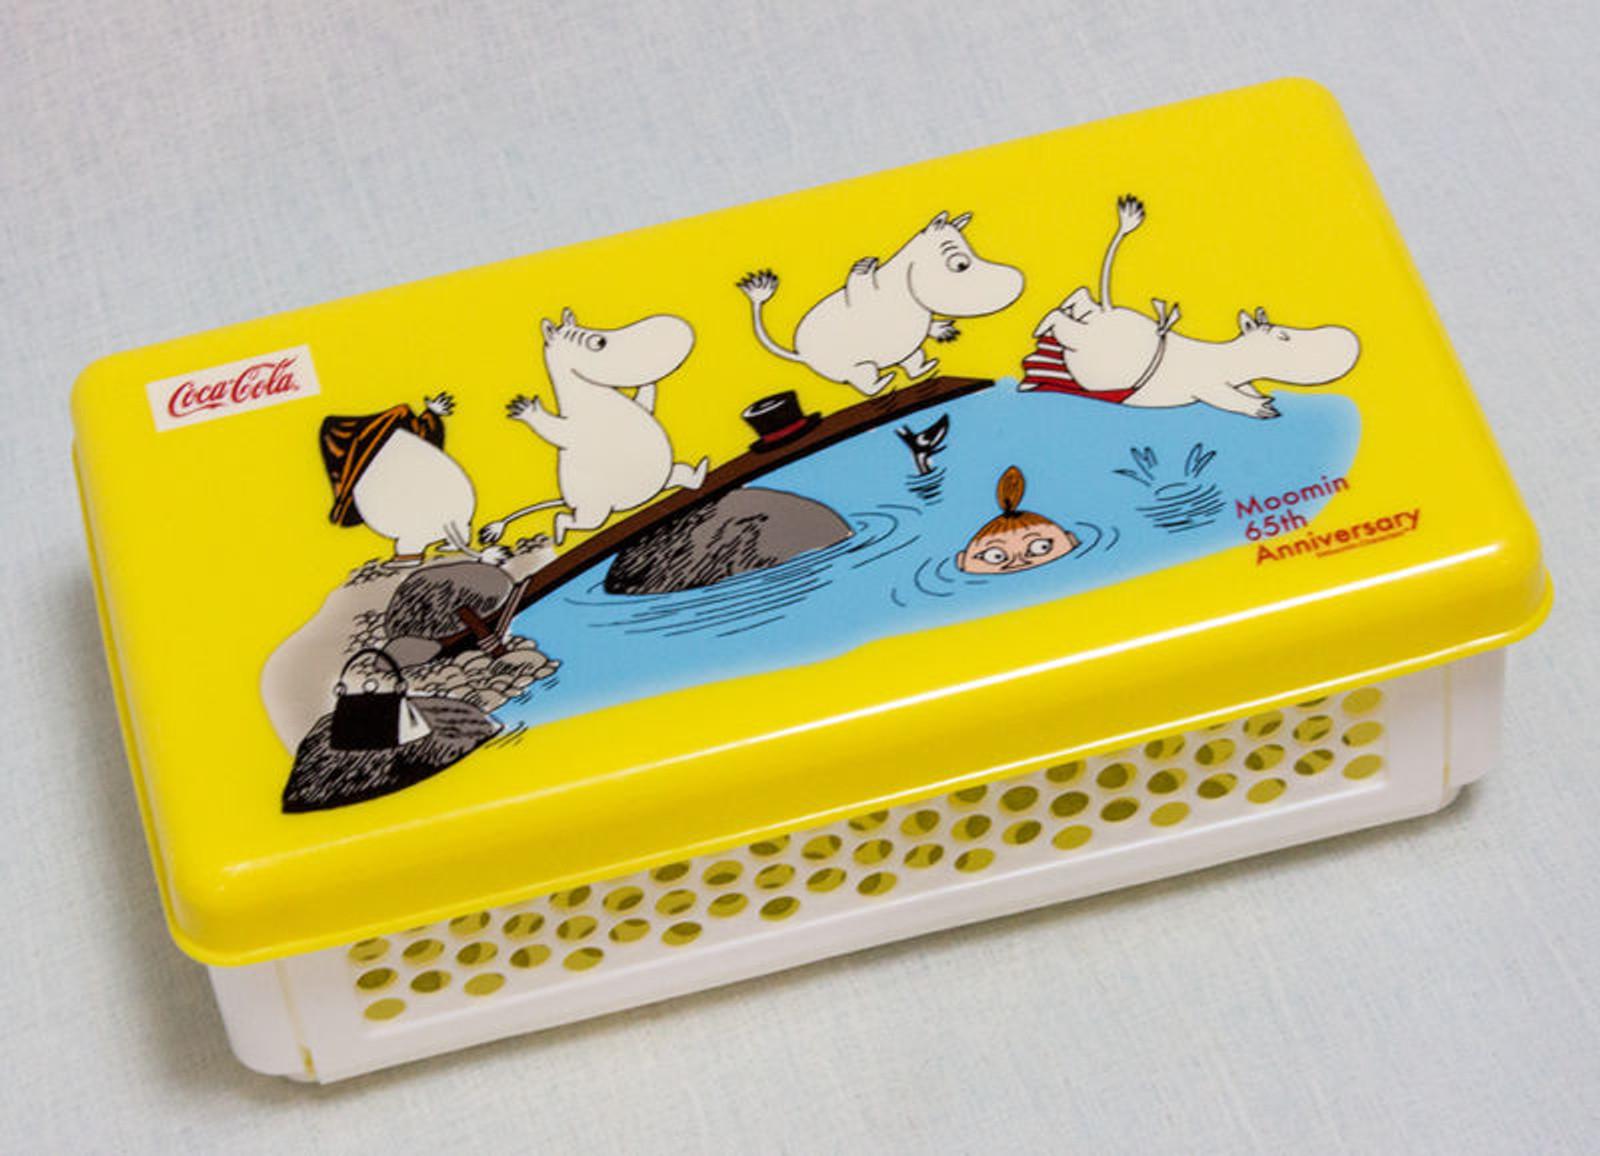 Moomin 65th Anniversary Japan Coca-Cola Prize Folding Lunch Box Sandwich Case